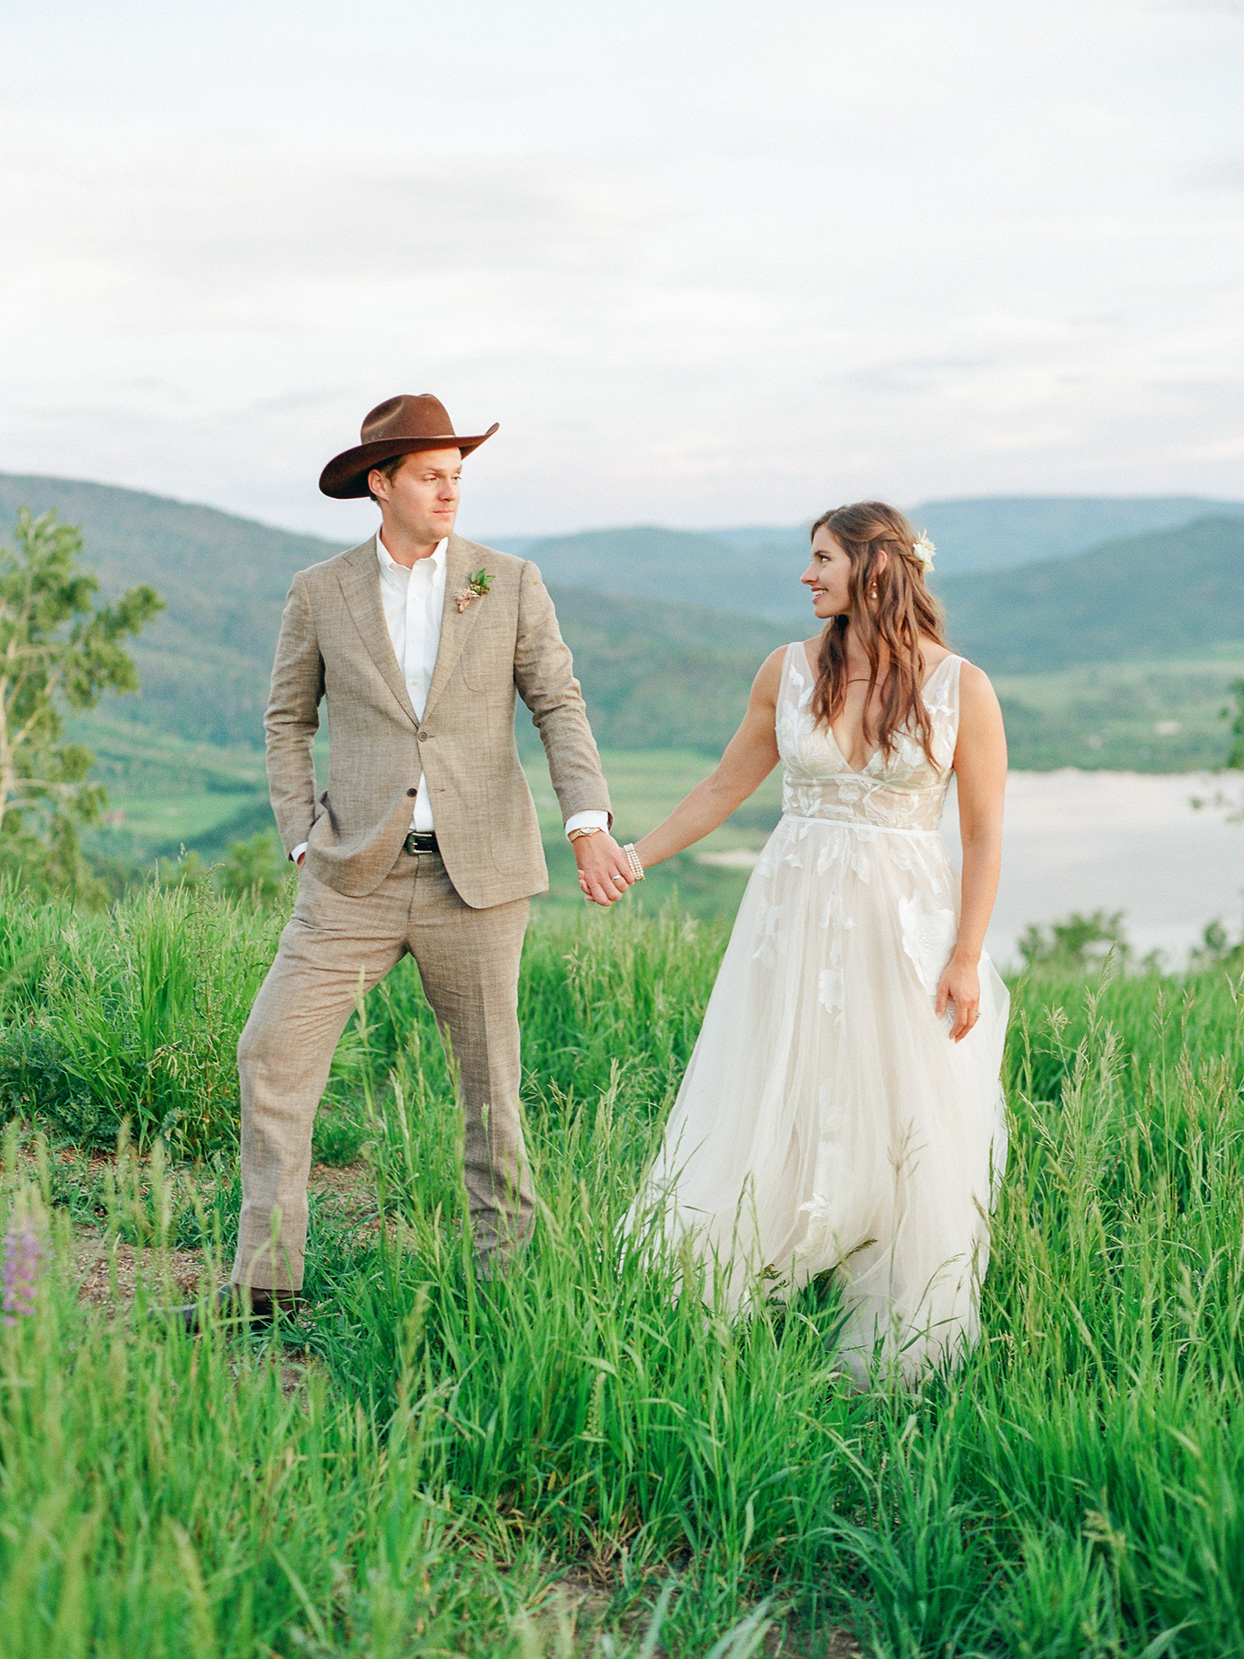 logan conor wedding couple holding hands